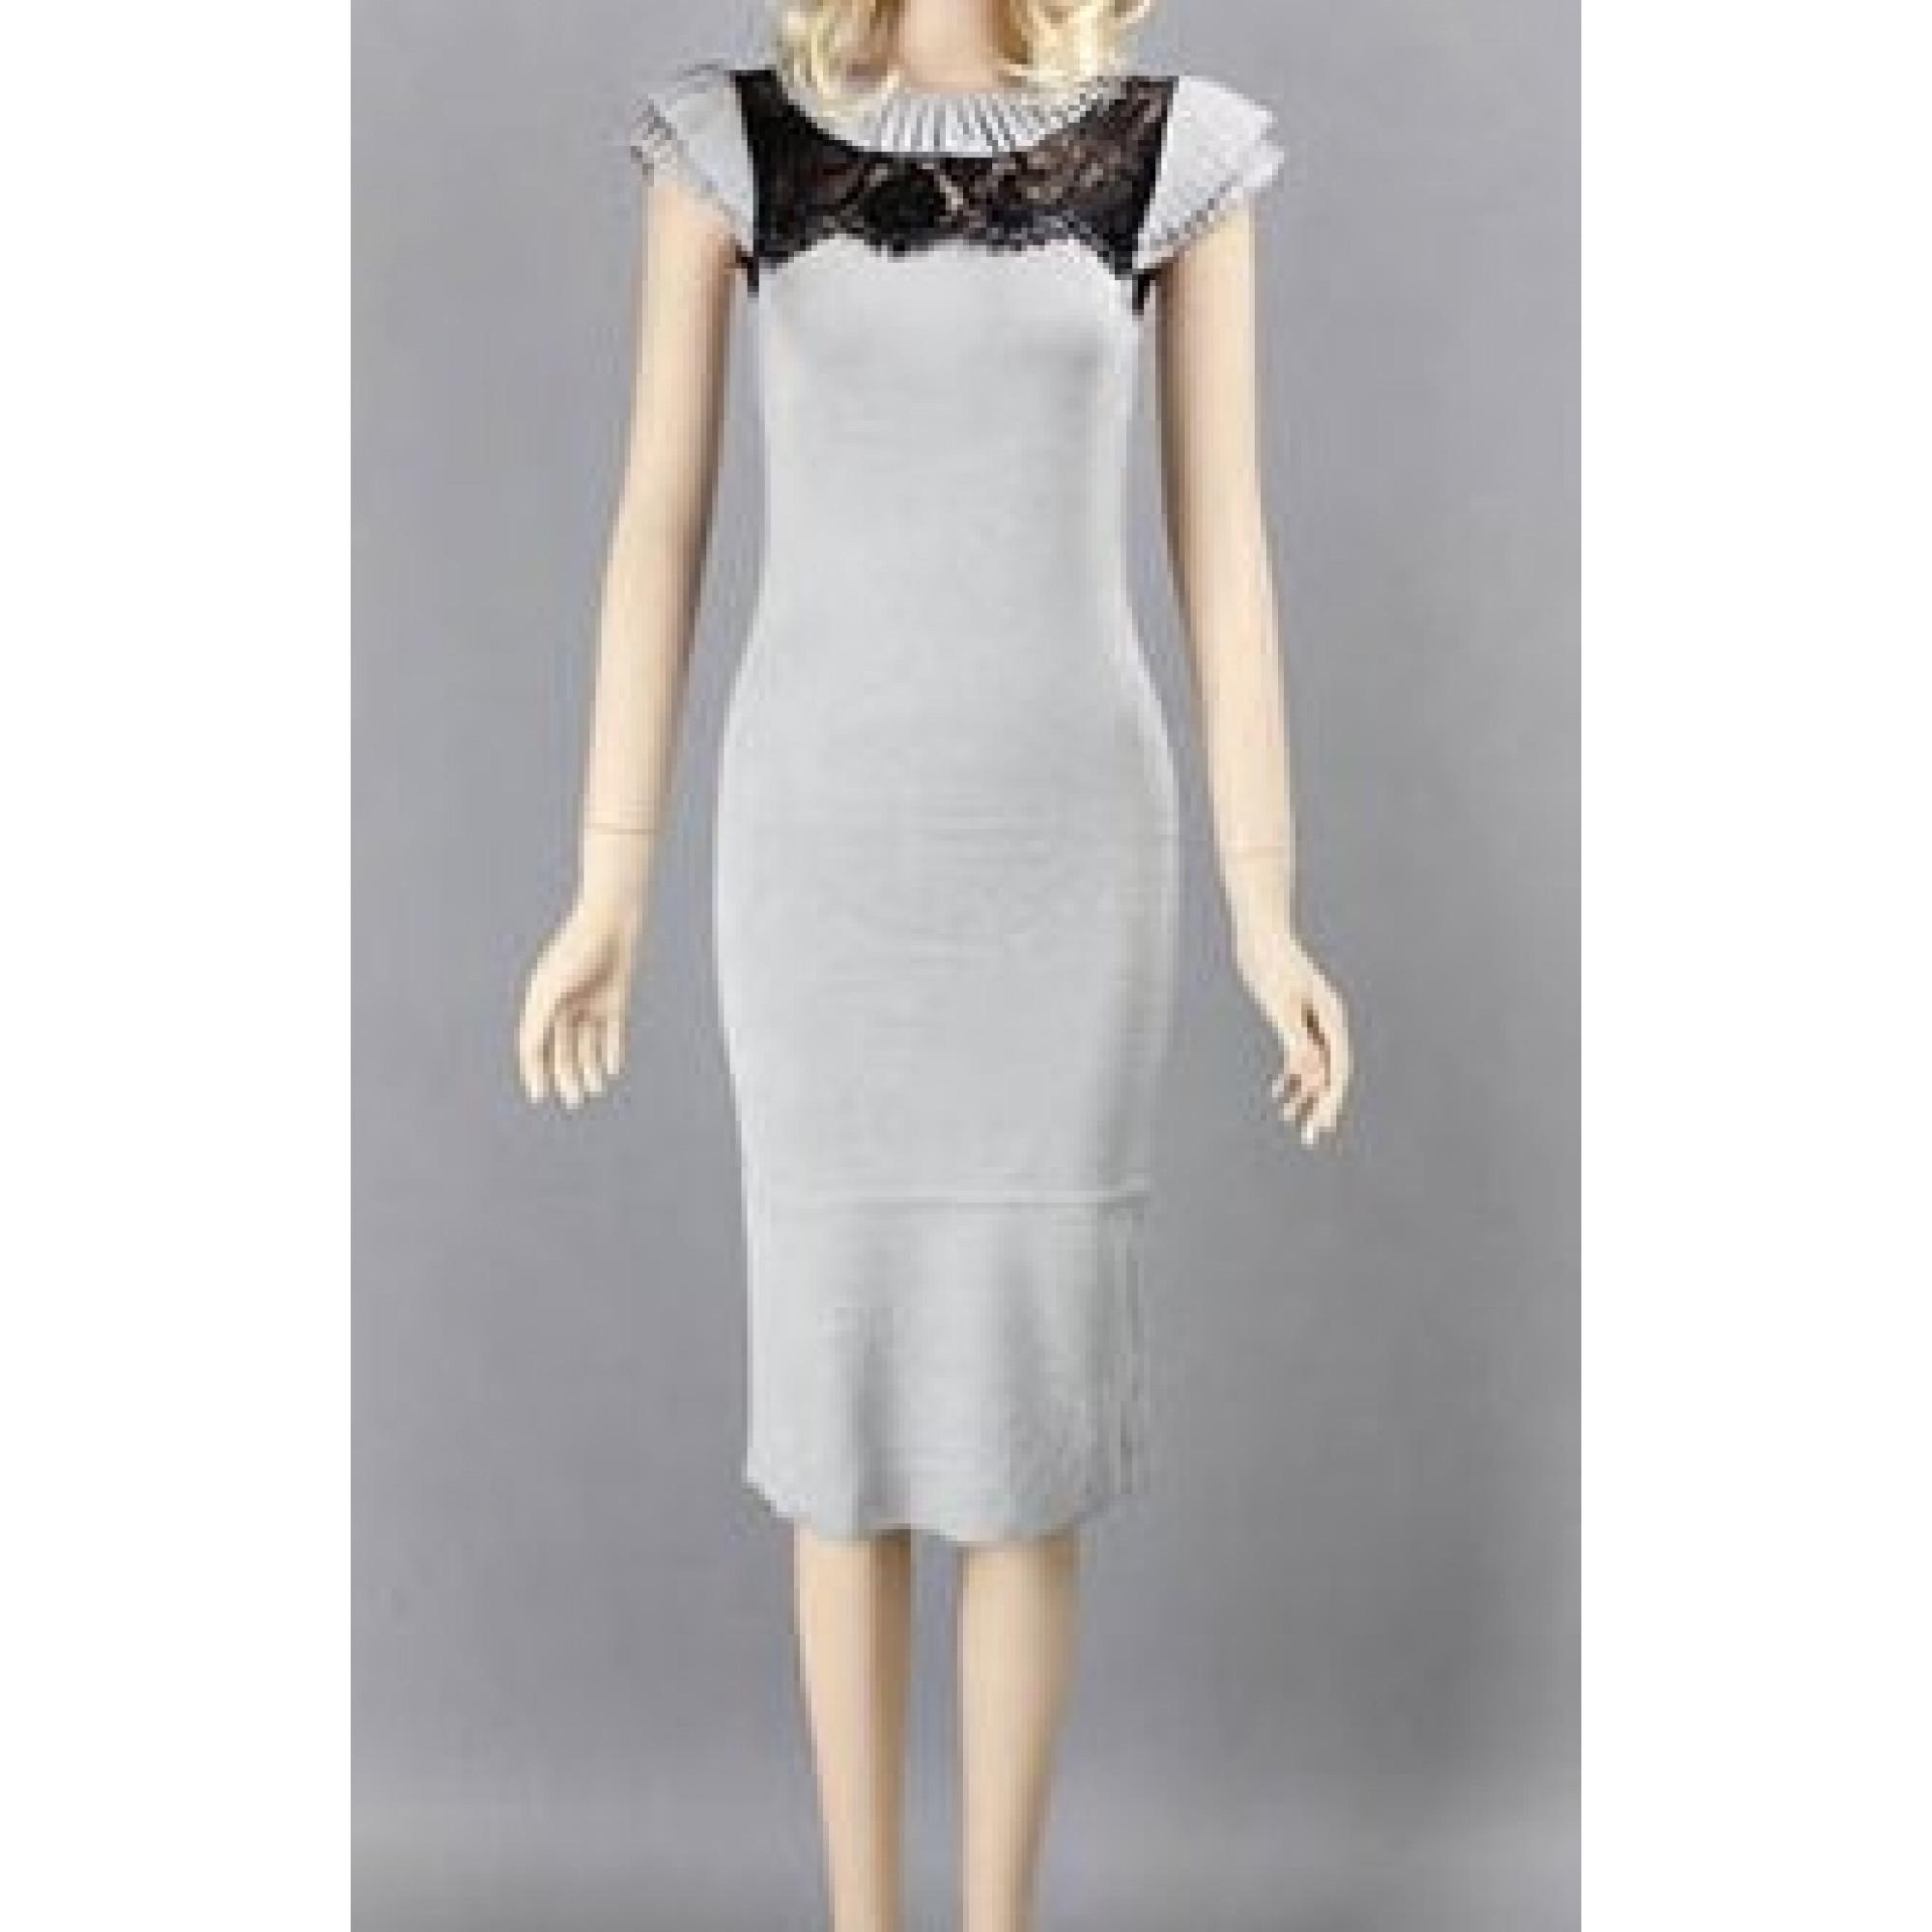 чехол для свадебного платья цена